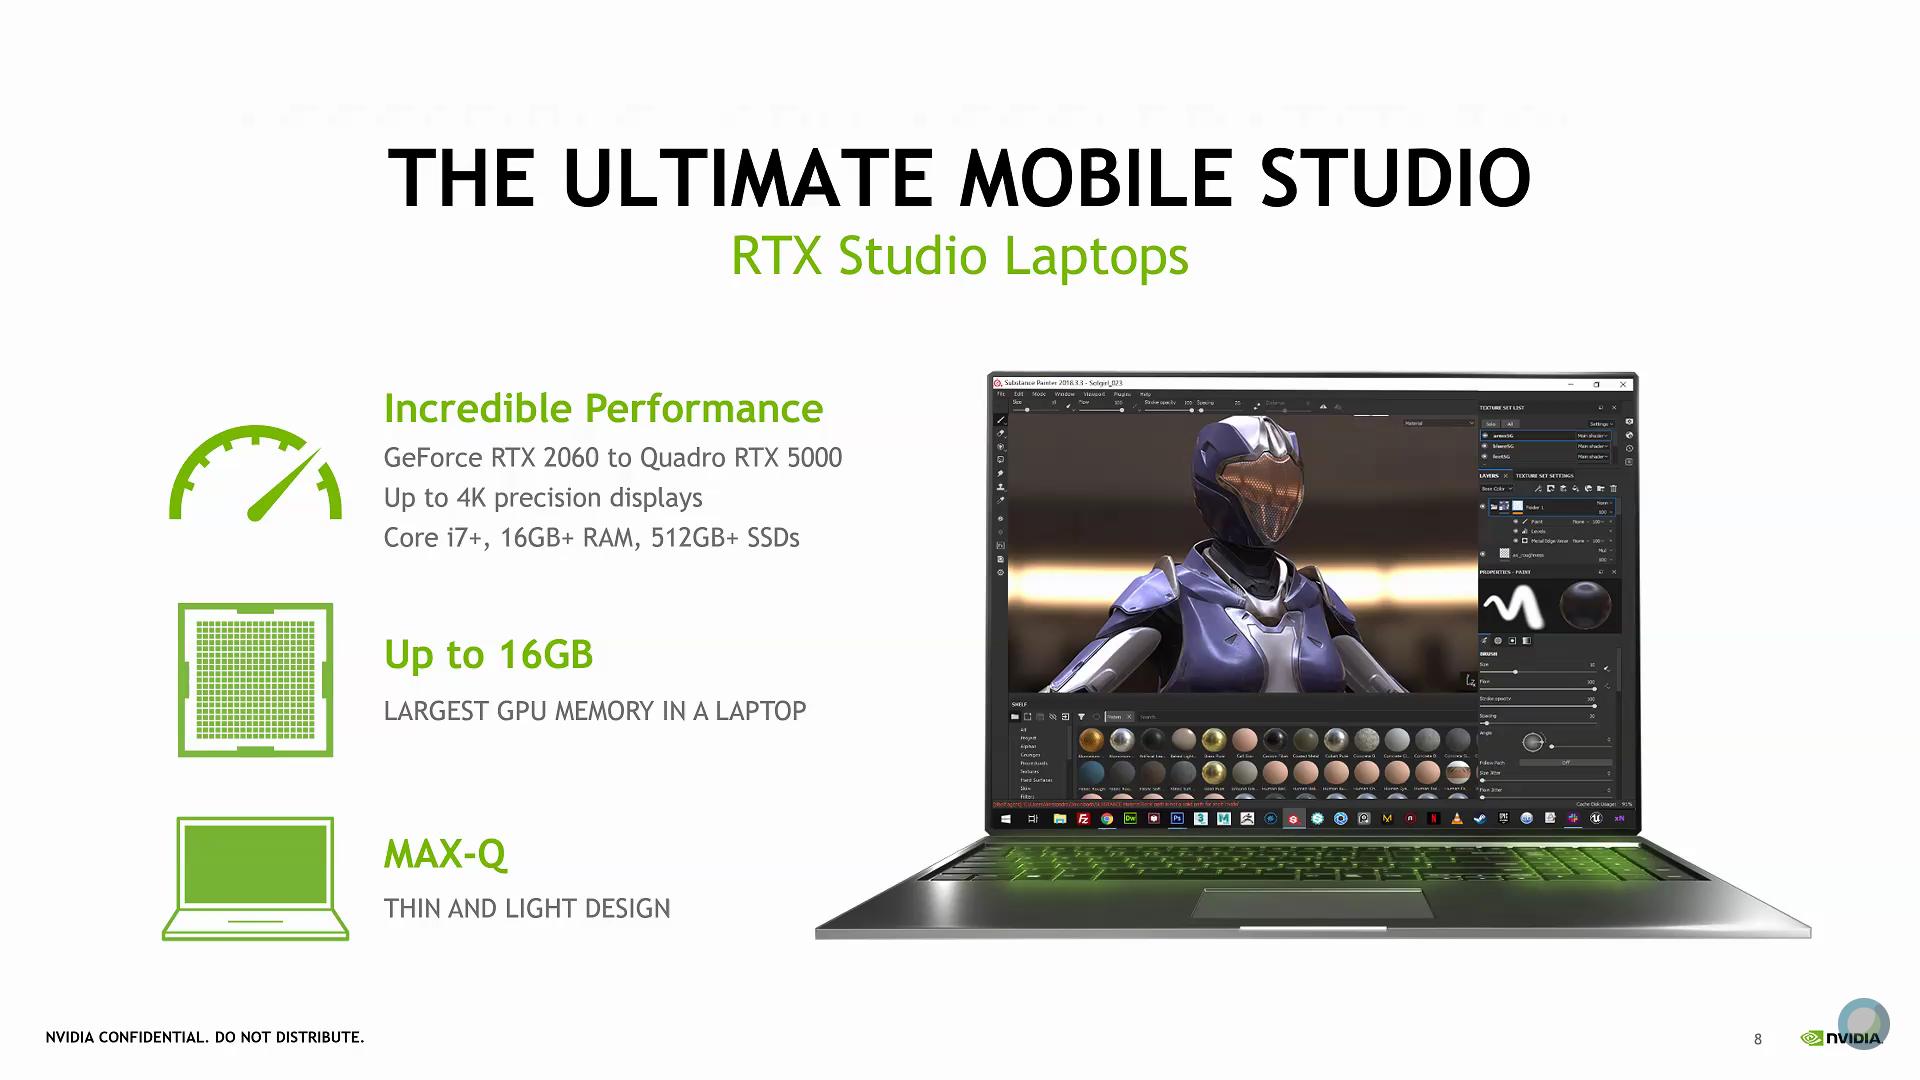 Nvidia-Studio-Laptops-01[igorslab]